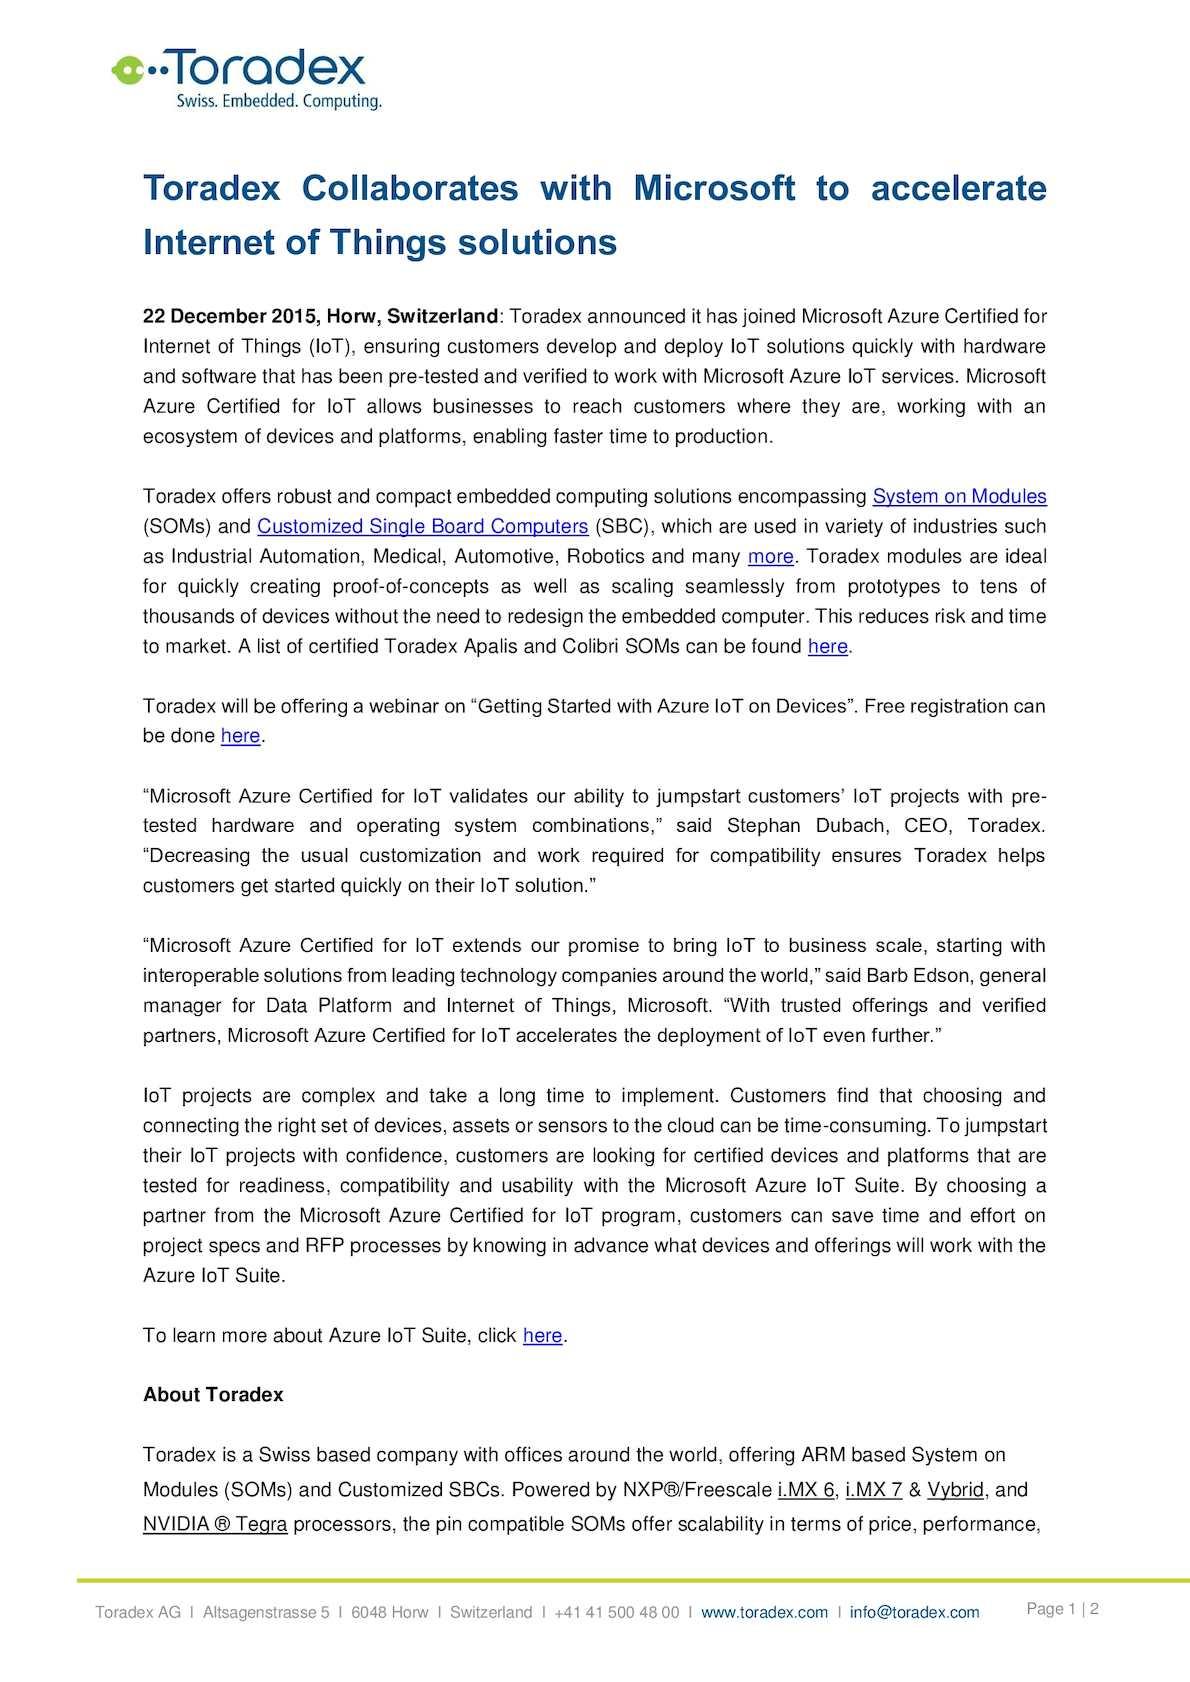 Calaméo - Toradex Collaborates with Microsoft to Accelerate Internet